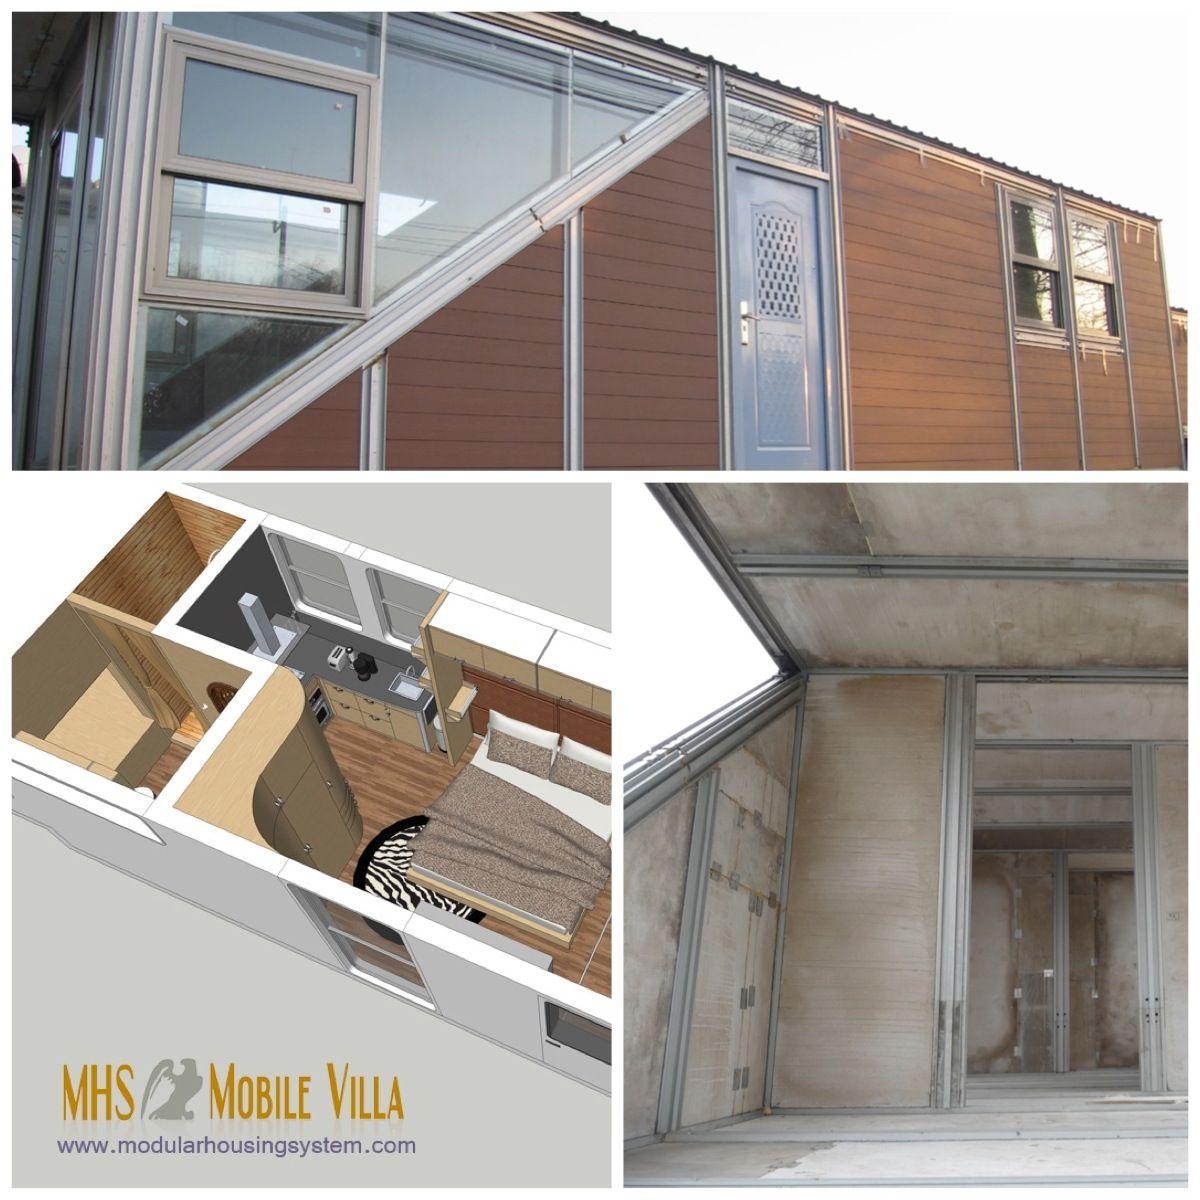 MHS MV built with MHS ALUMINUM FRAMING SYSTEM | Mobile prefab ...